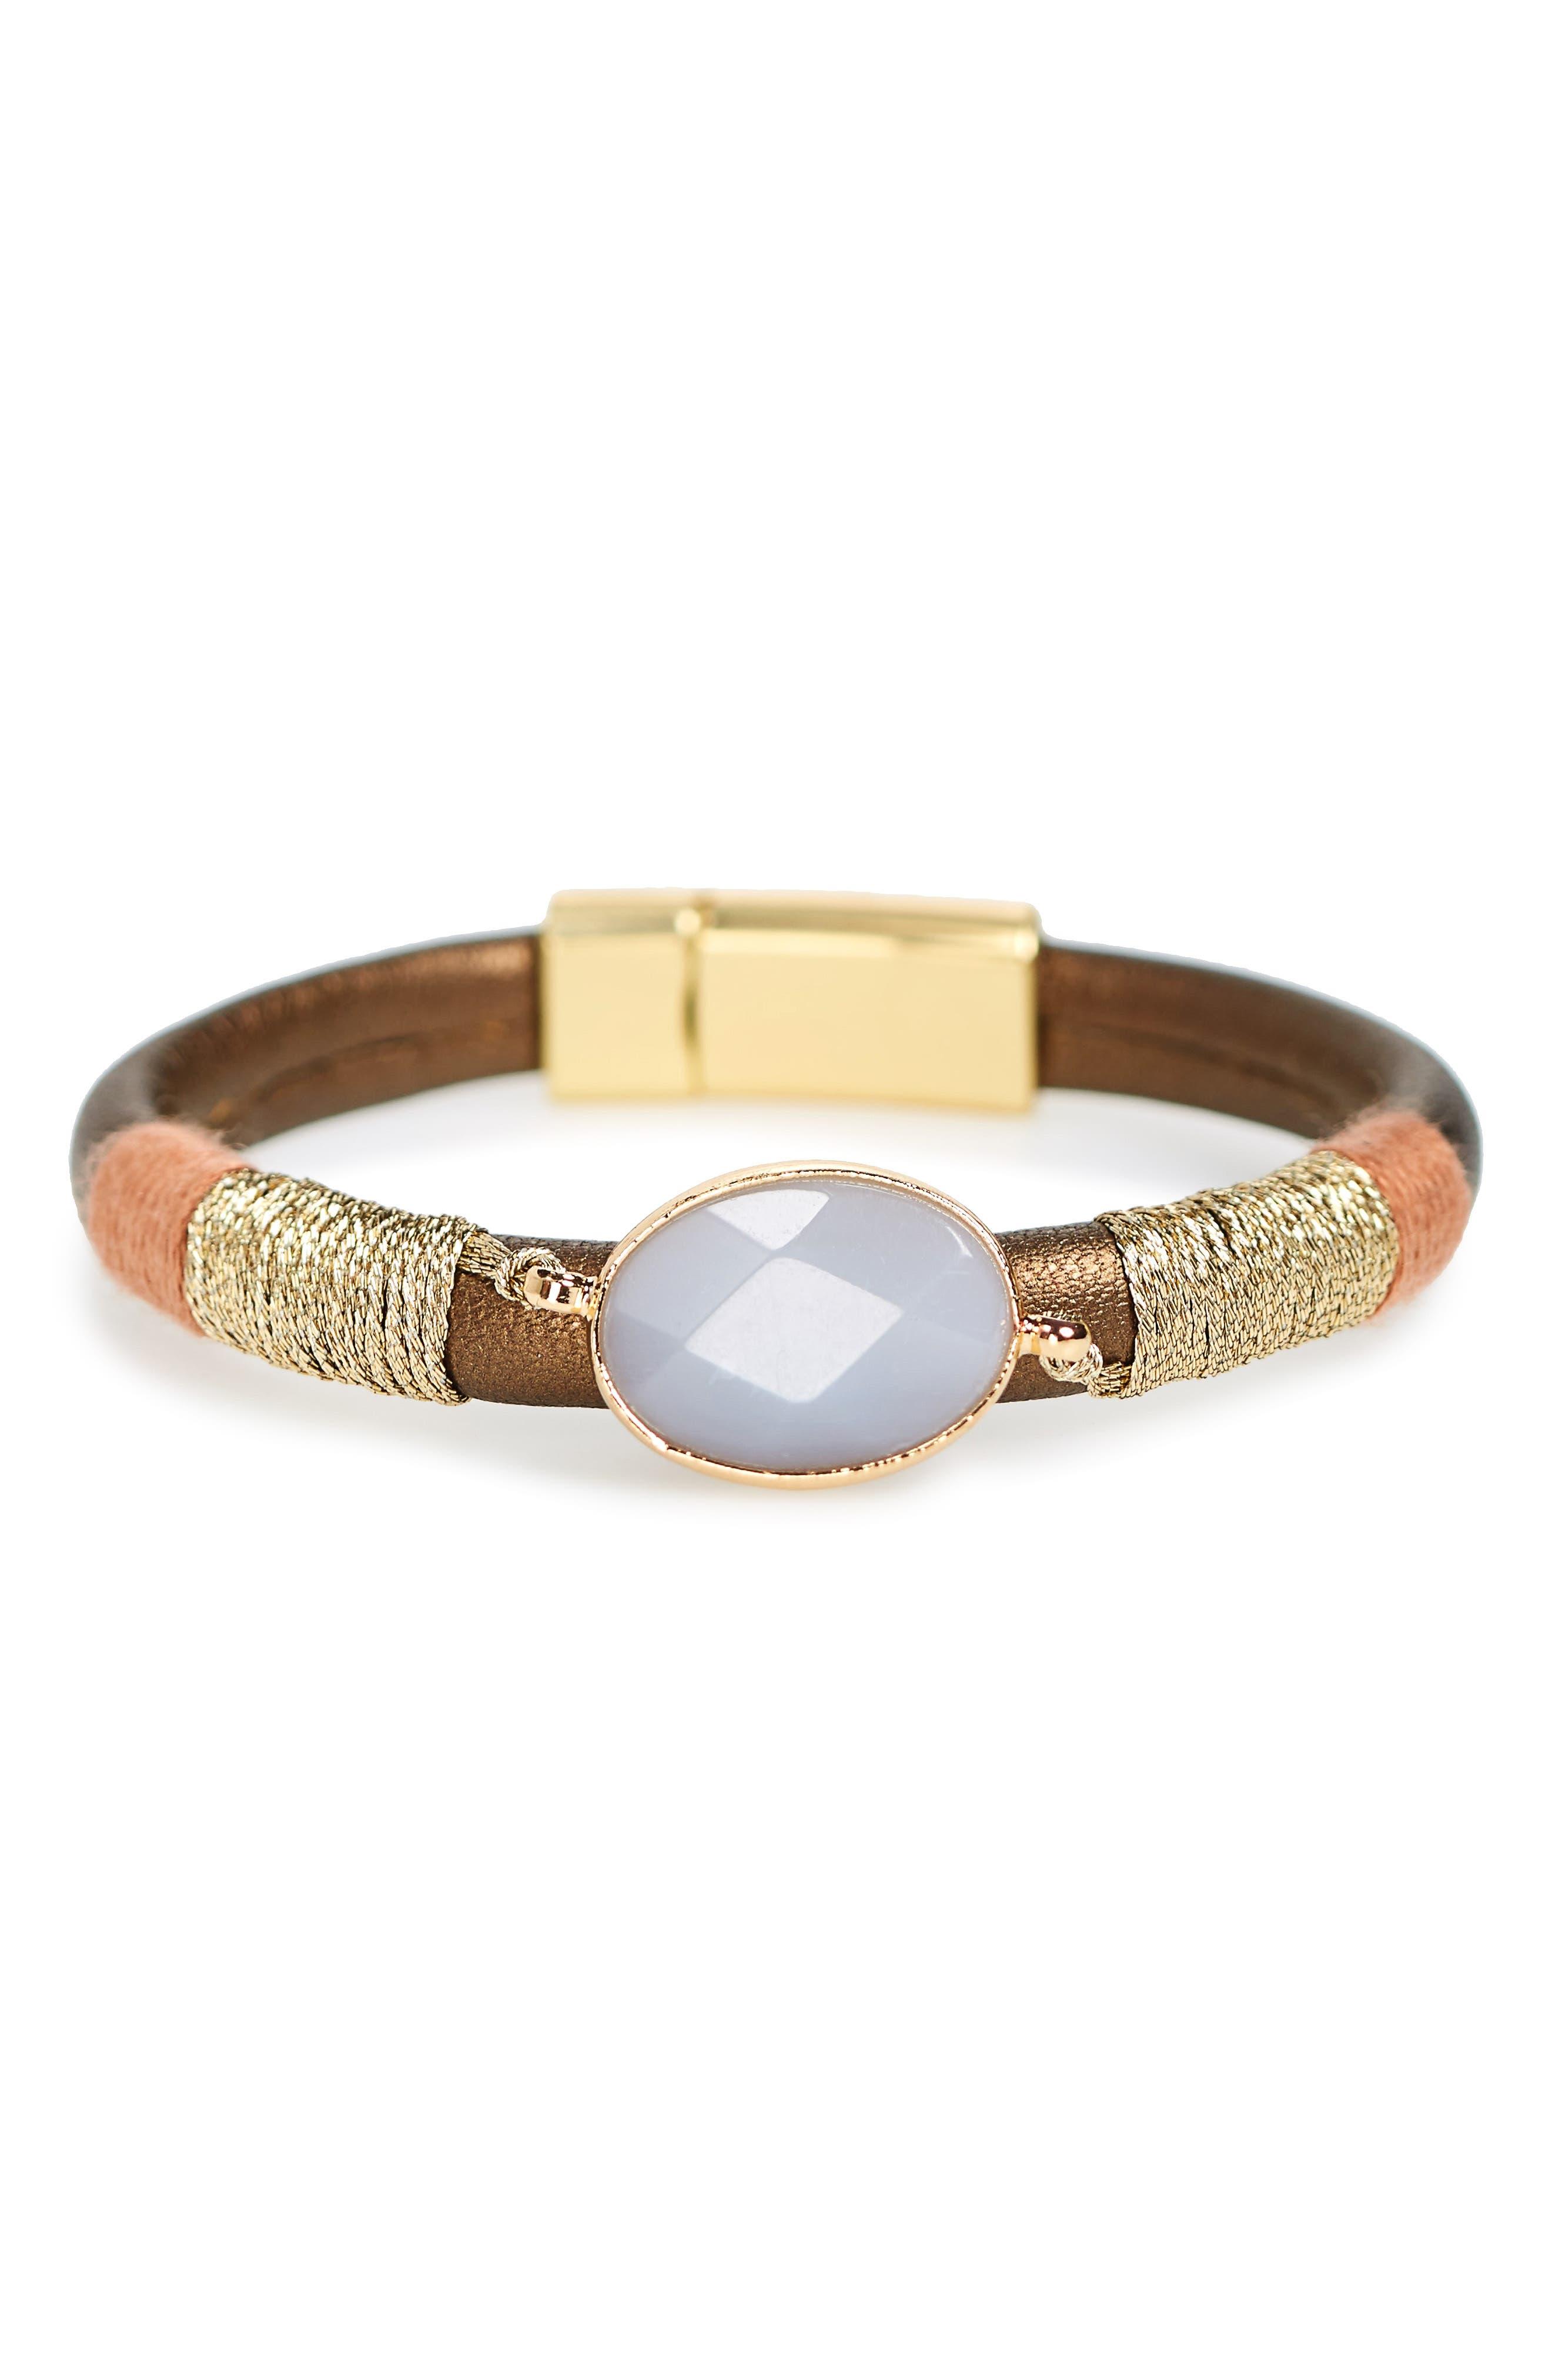 Leather & Agate Bracelet,                         Main,                         color, Grey Multi